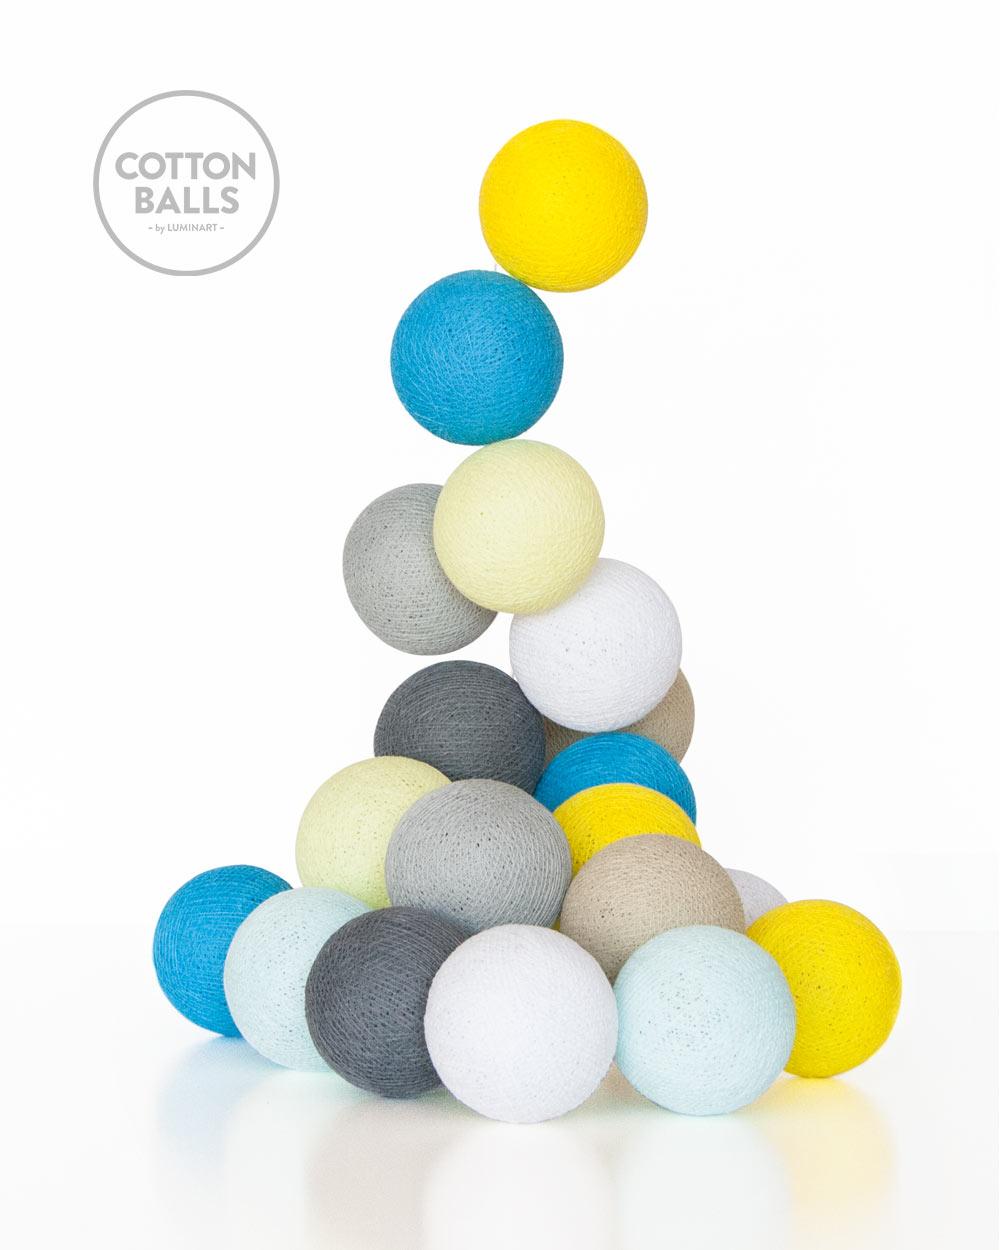 GRINALDA COTTON BALLS SunnyTurquoises 10 BOLAS